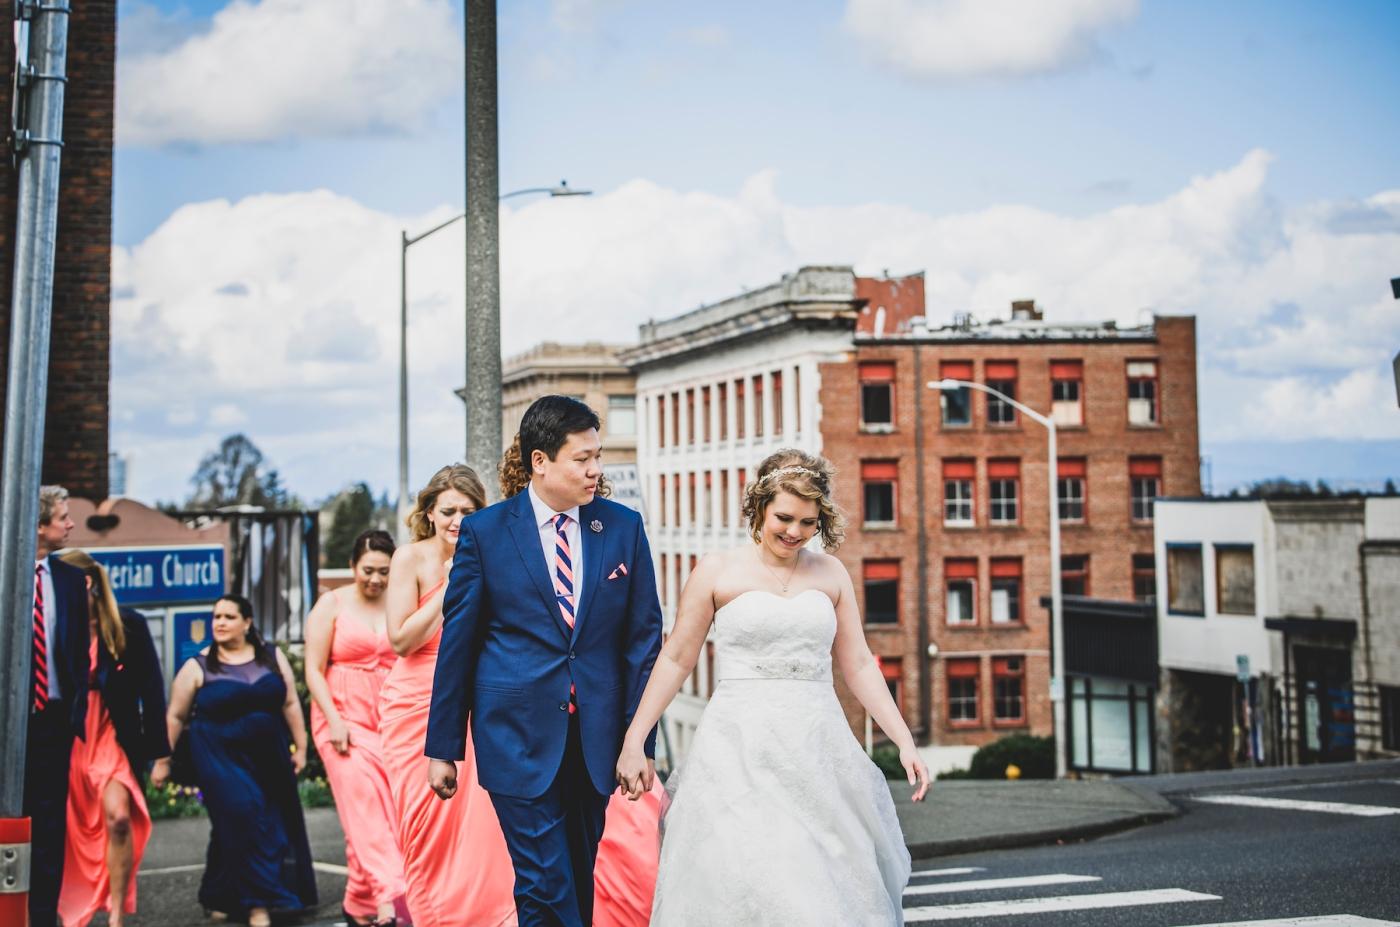 DSC_2228Everett_Wedding_Ballroom_Jane_Speleers_photography_Rachel_and_Edmund_Bridesmaids_peach_dresses_groomsmen_2017